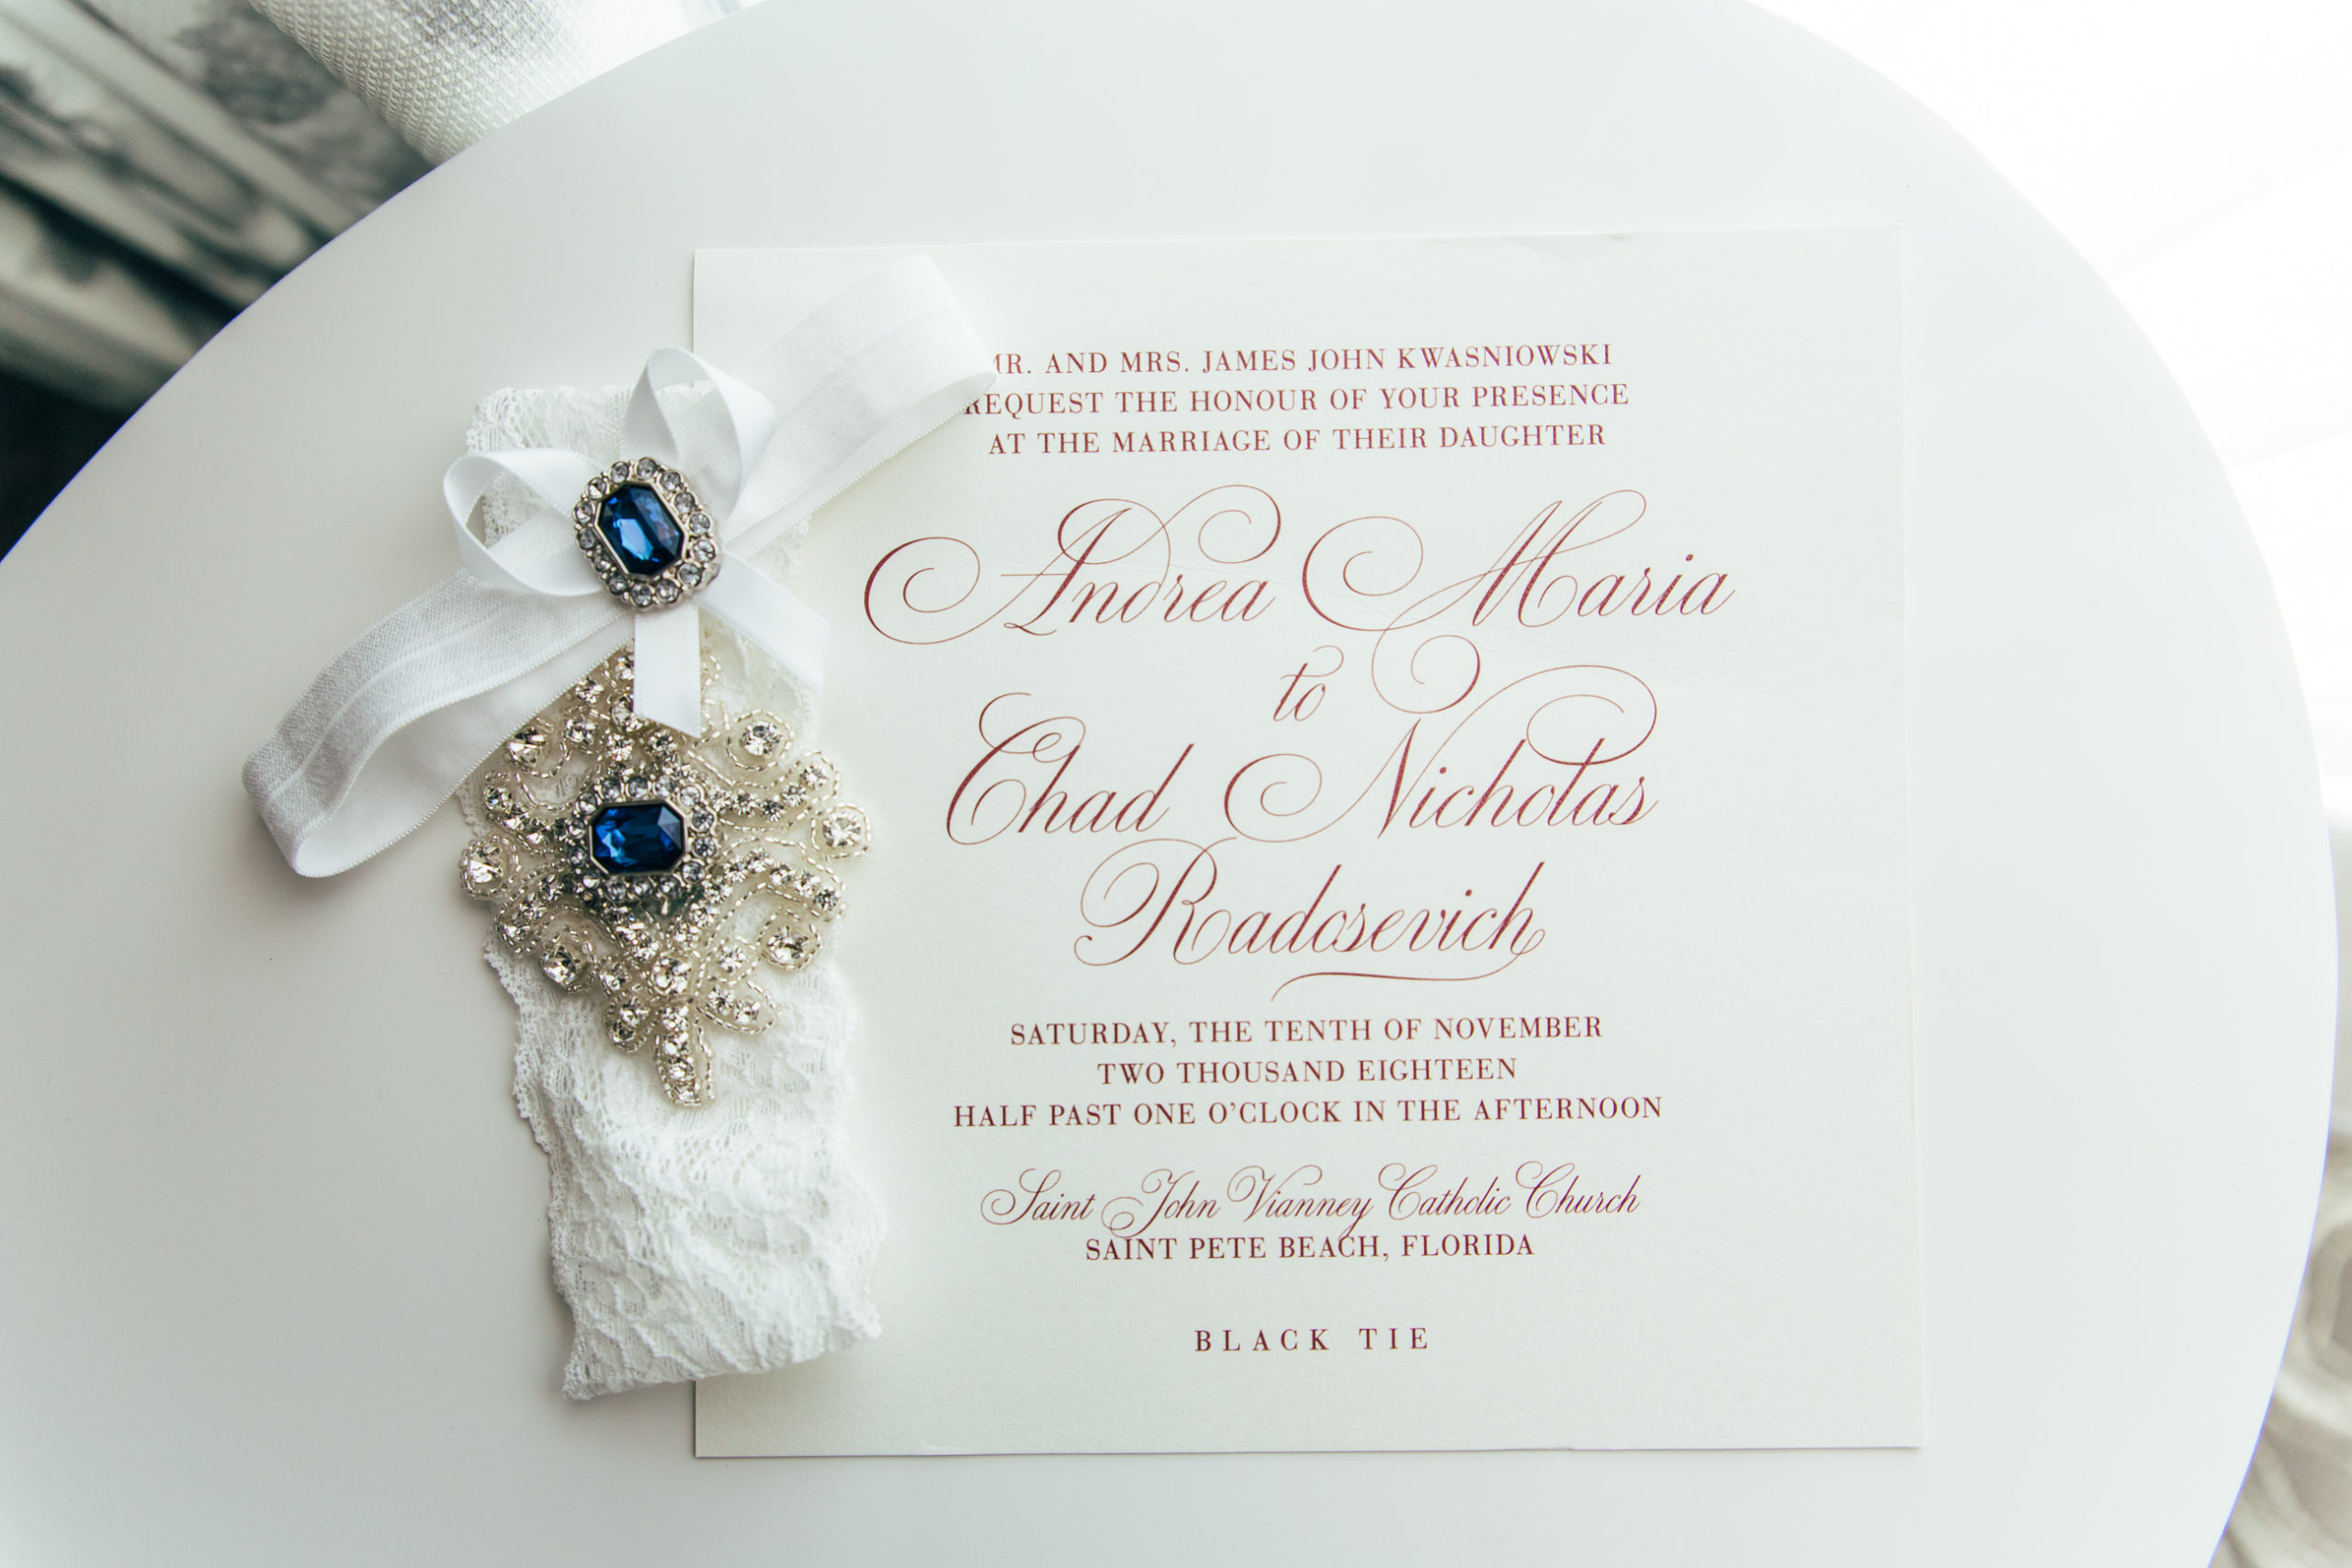 Classic Elegant White and Red Script Wedding Invitation, White Lace with Rhinestone and Blue Gems Bridal Garter   Tampa Bay Wedding Stationery URBANcoast